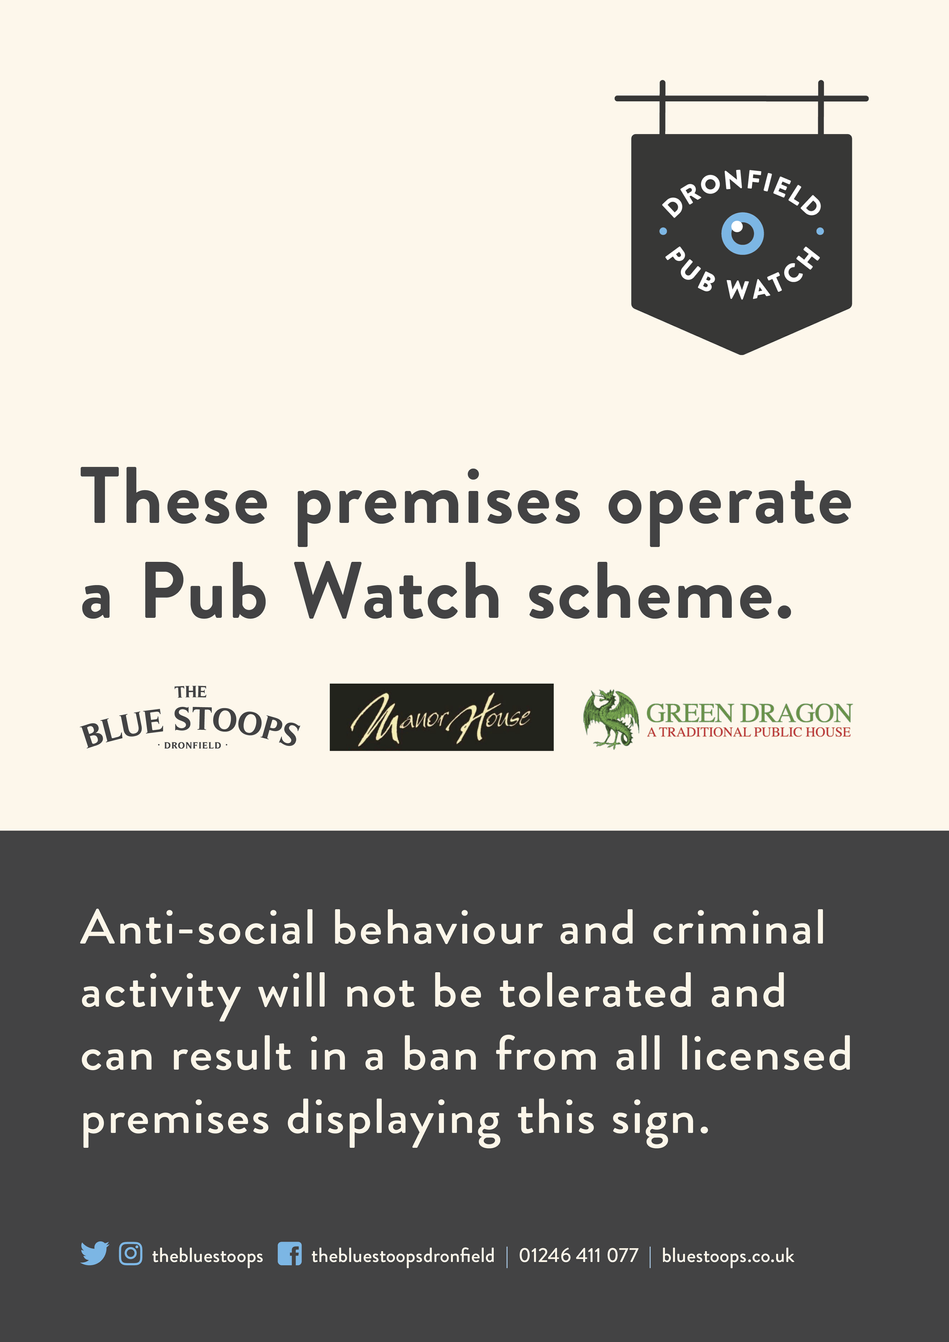 Dronfield Pub Watch